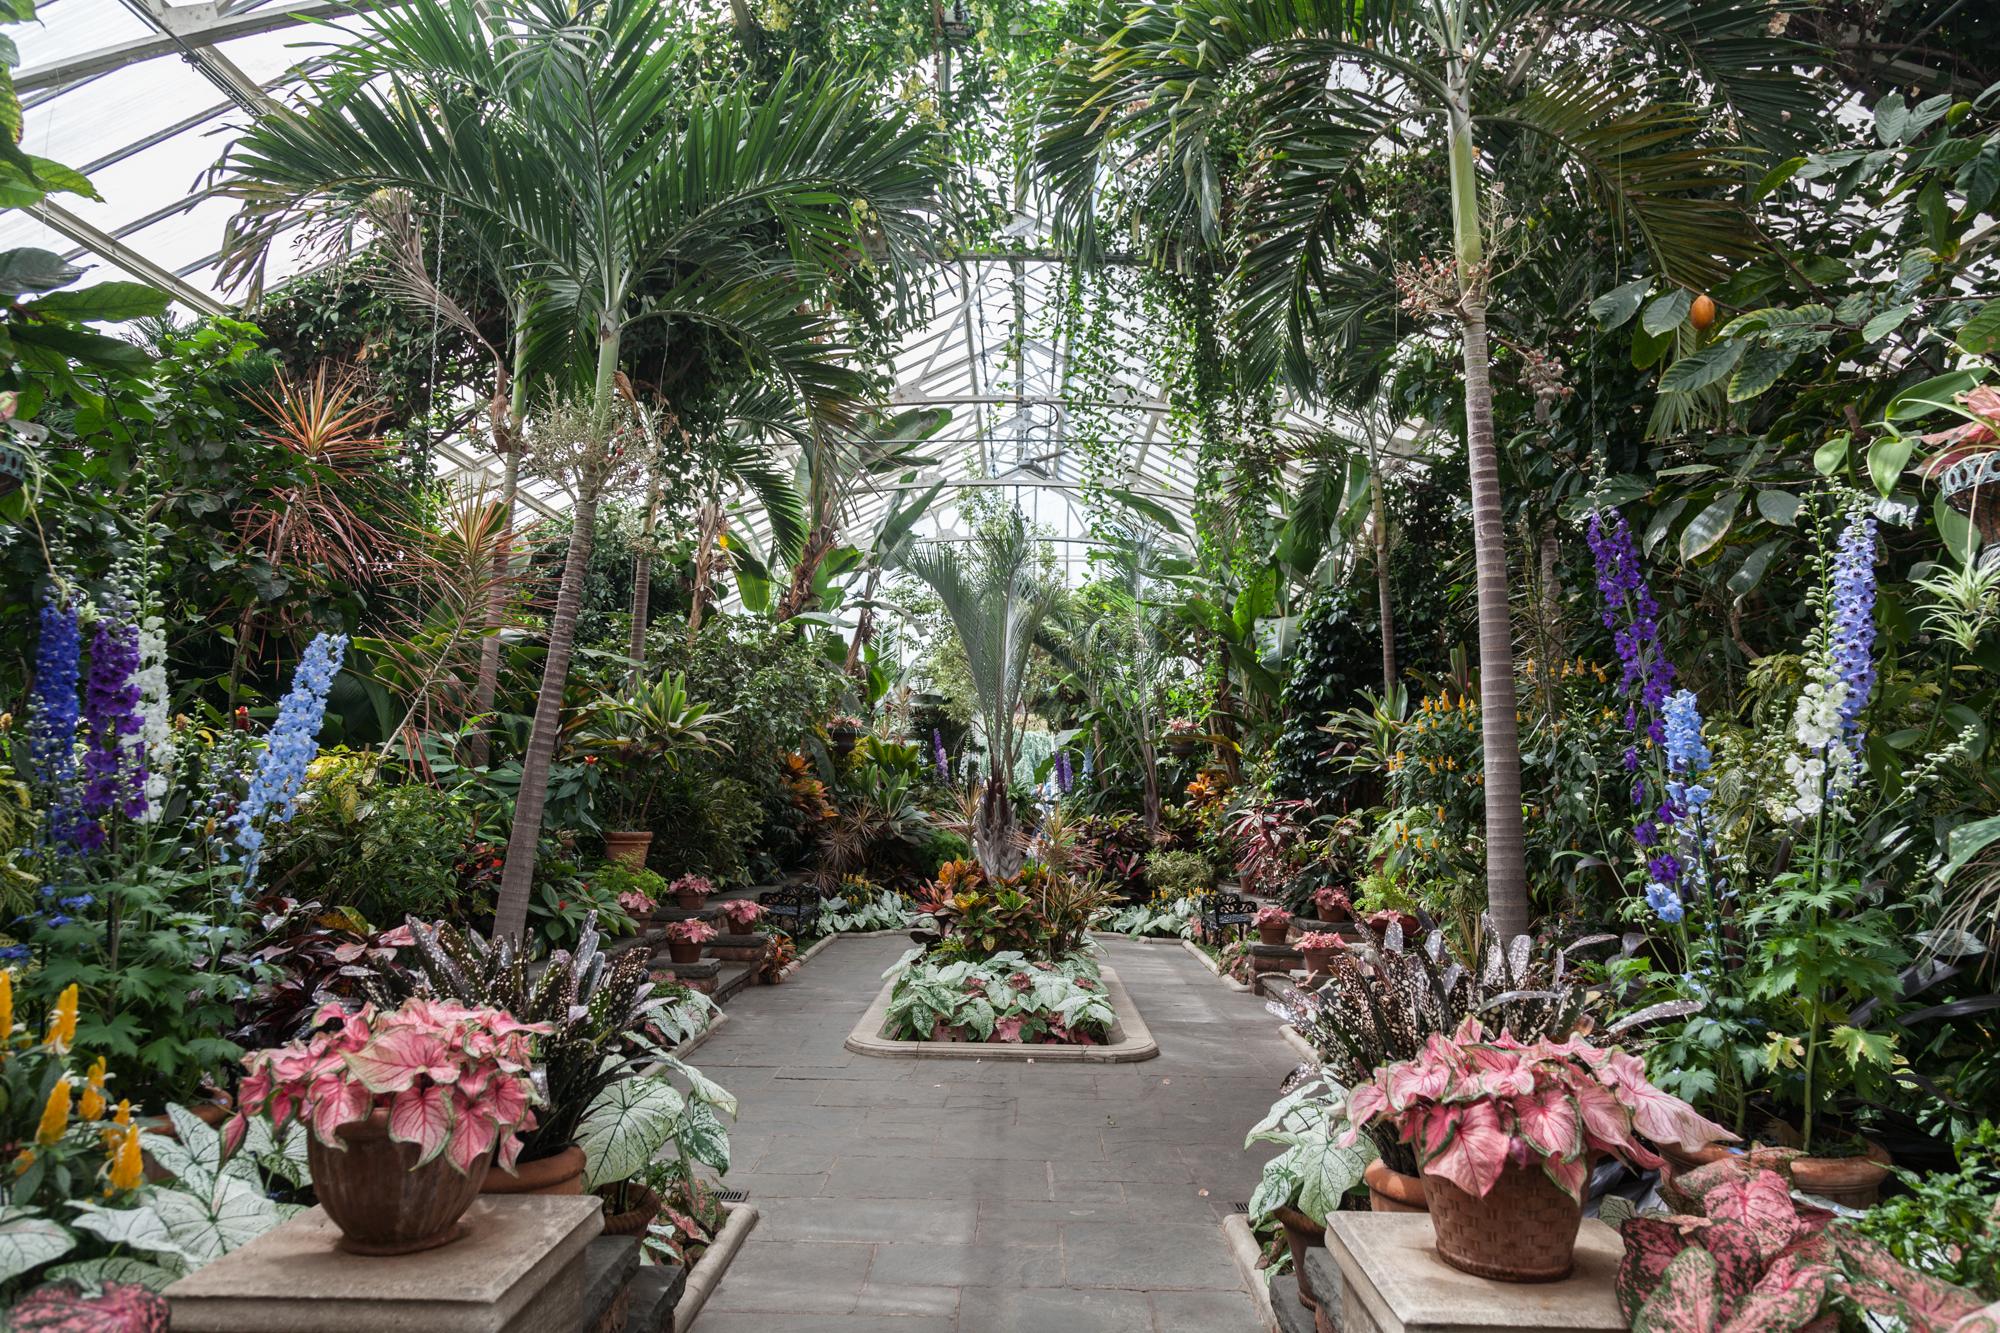 The grandeur of the main greenhouse